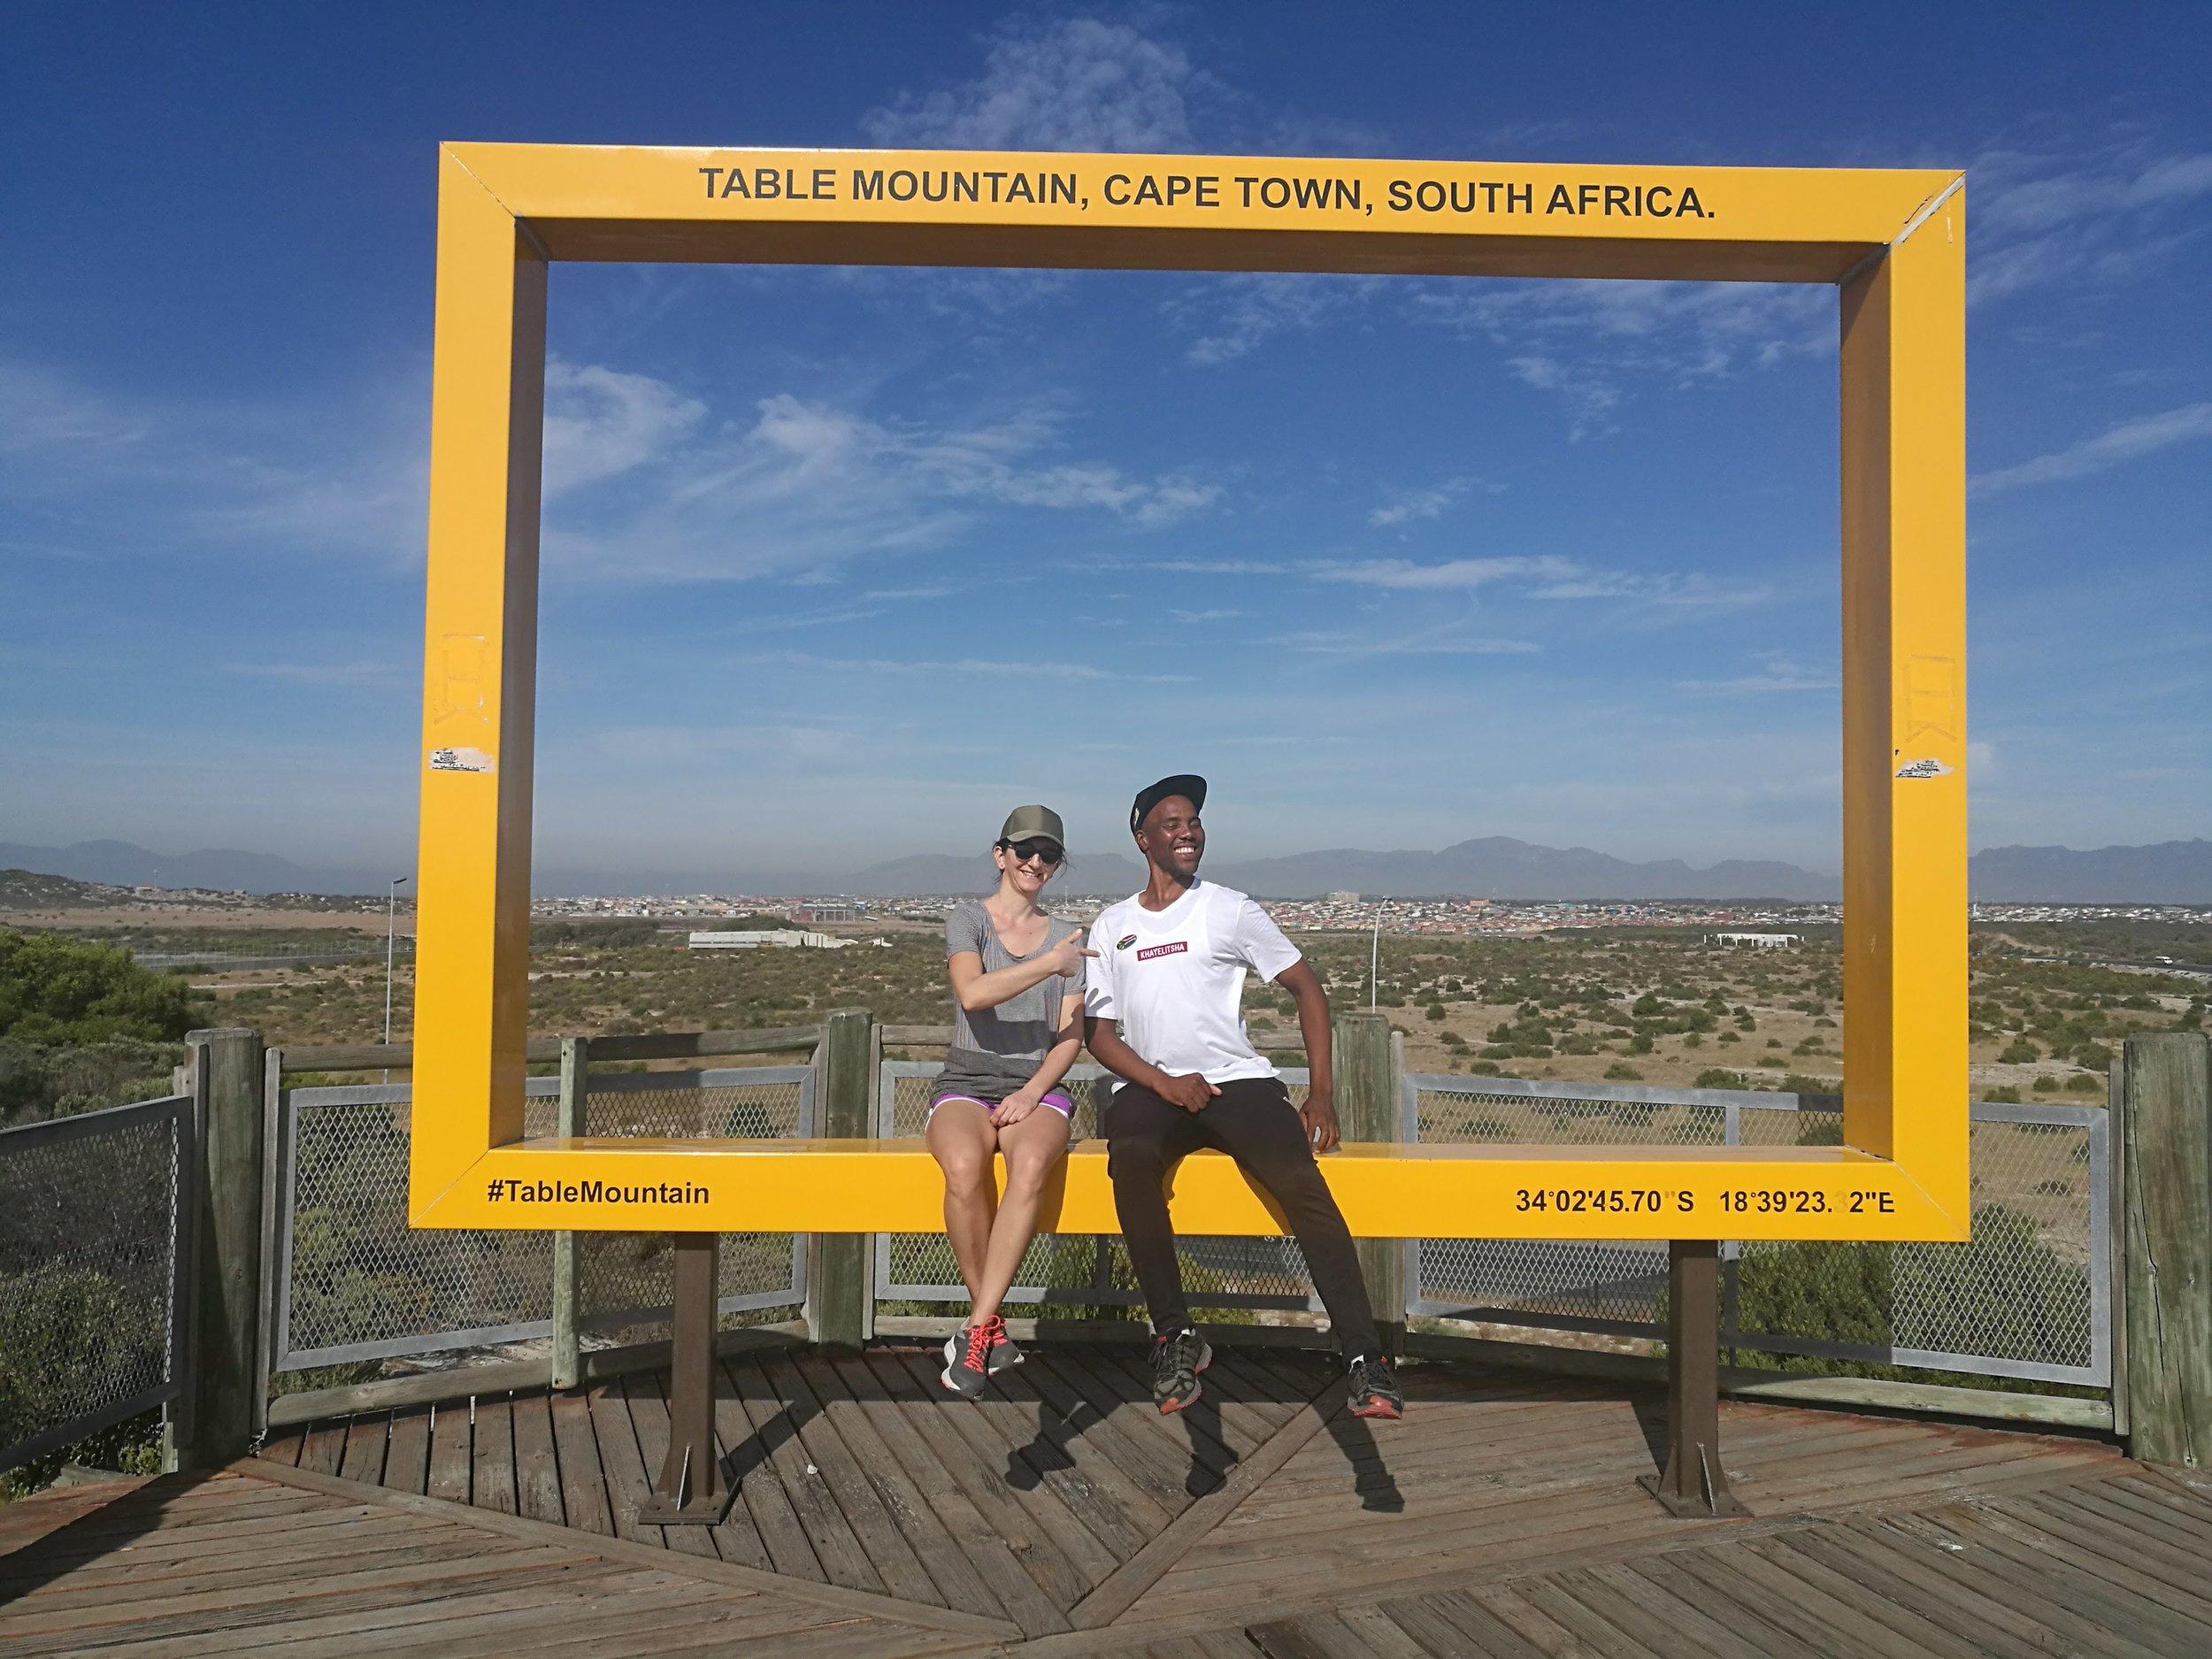 khayelitsha township viewpoint